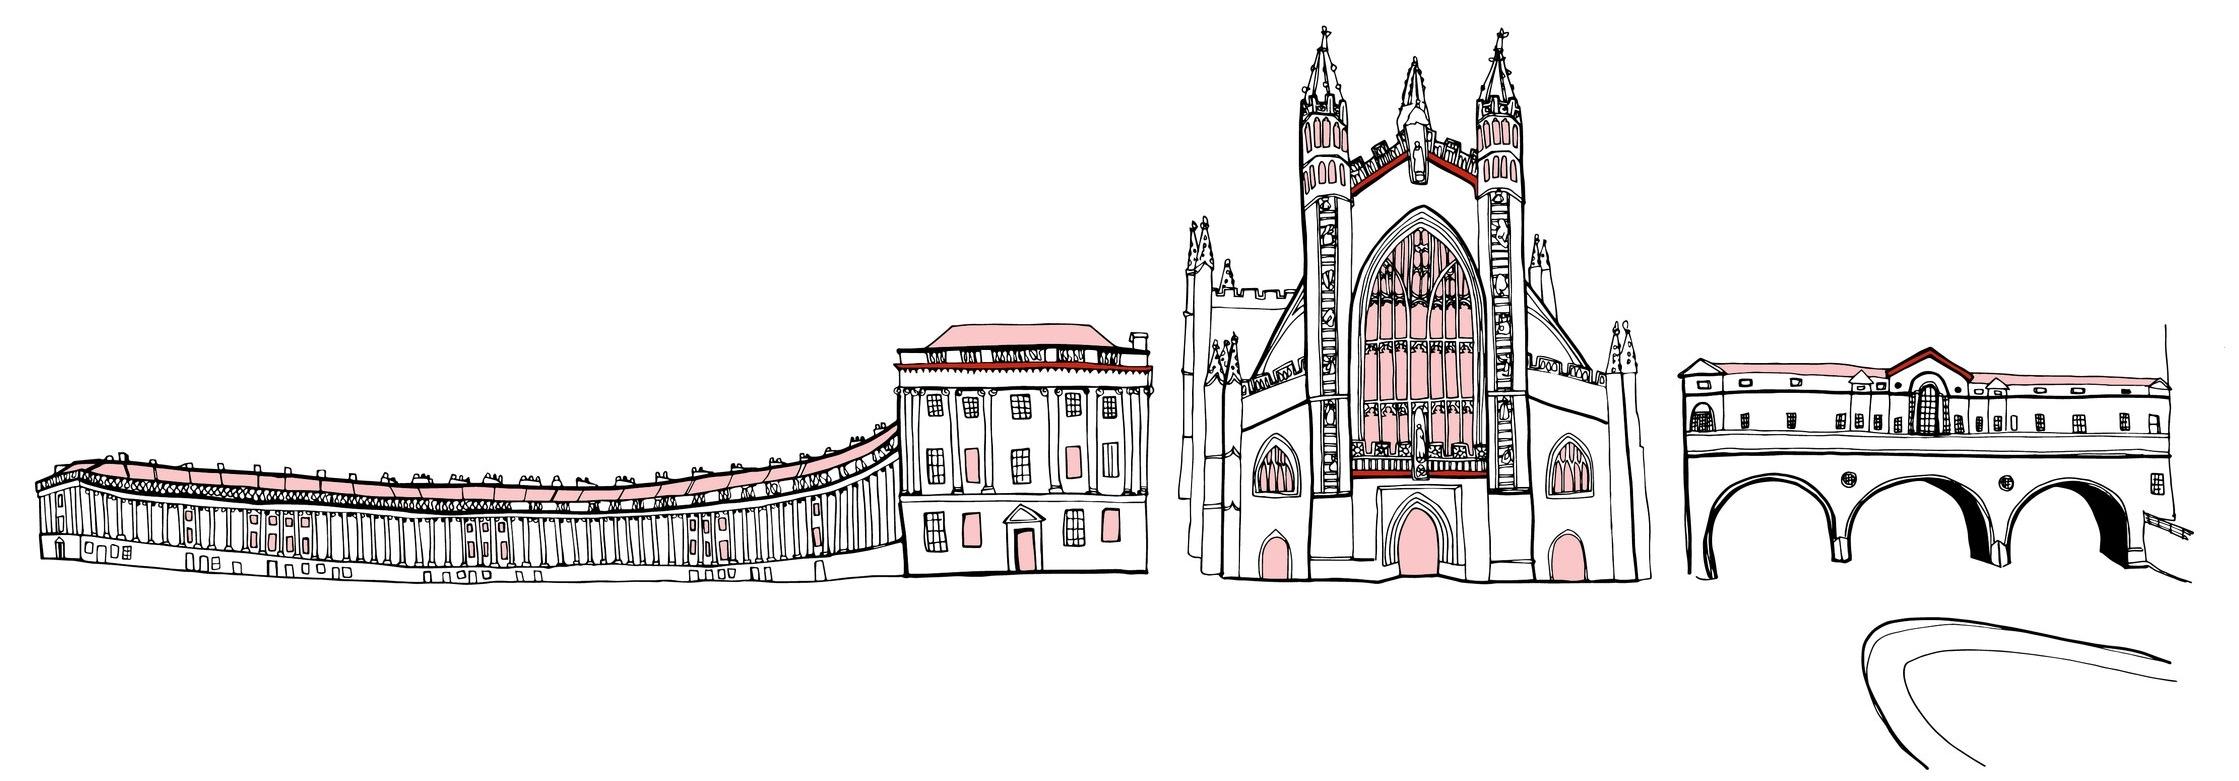 TEDx Bath illustration.jpg